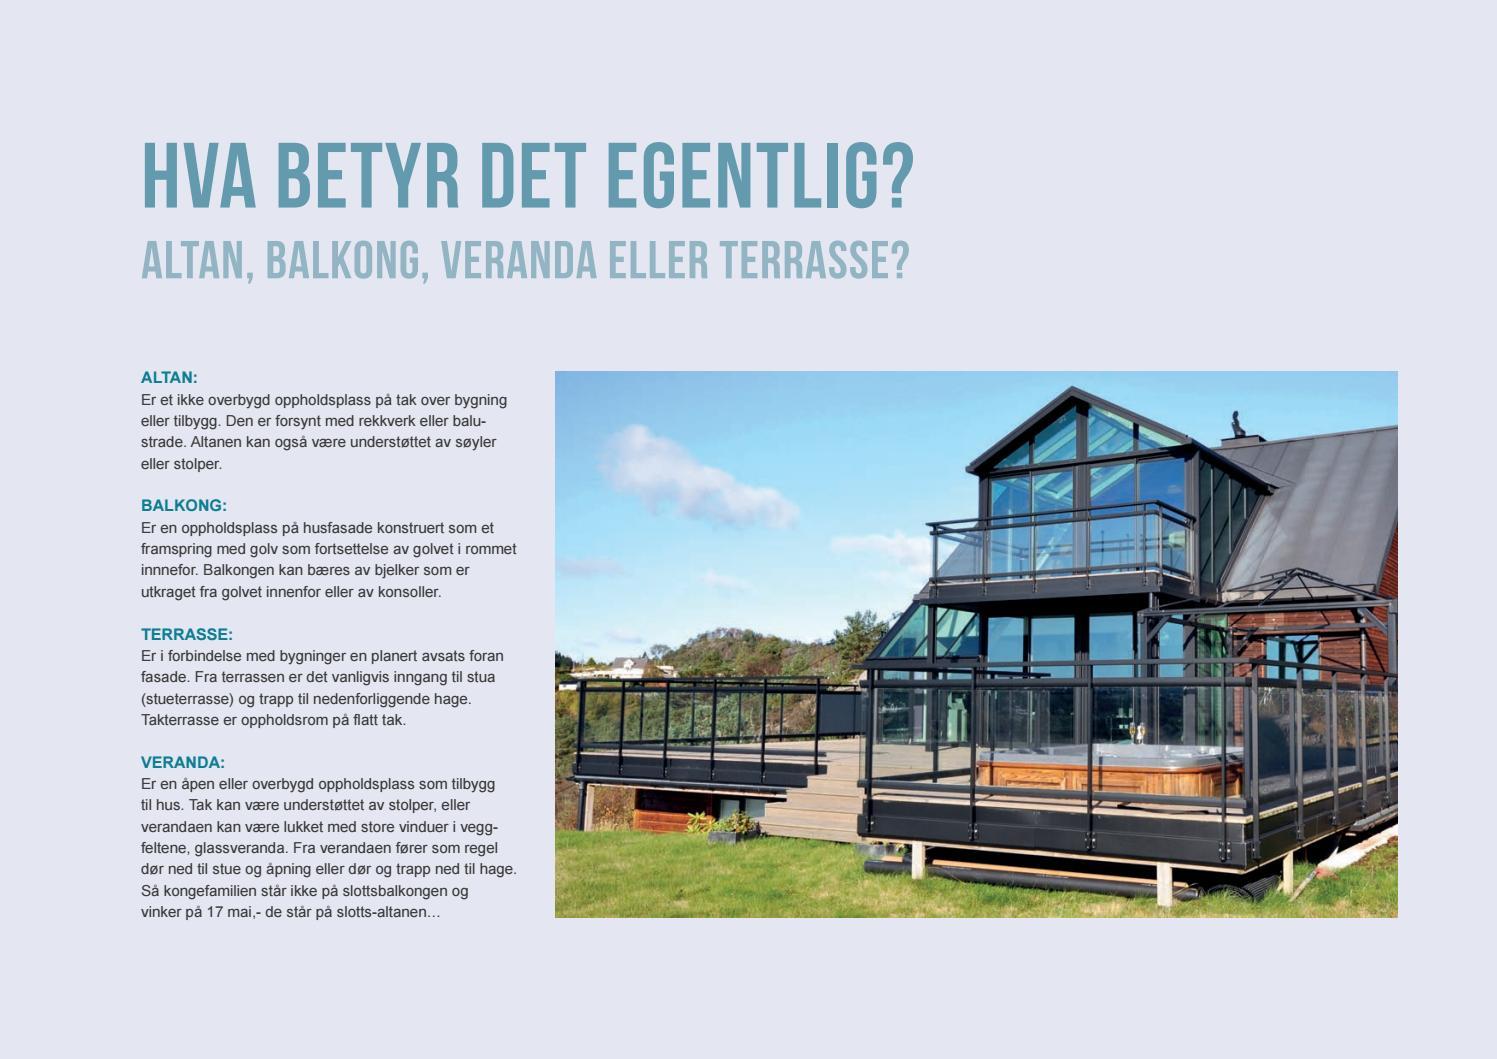 Terrassen Veranda verandakatalogen 2016 by molvik issuu